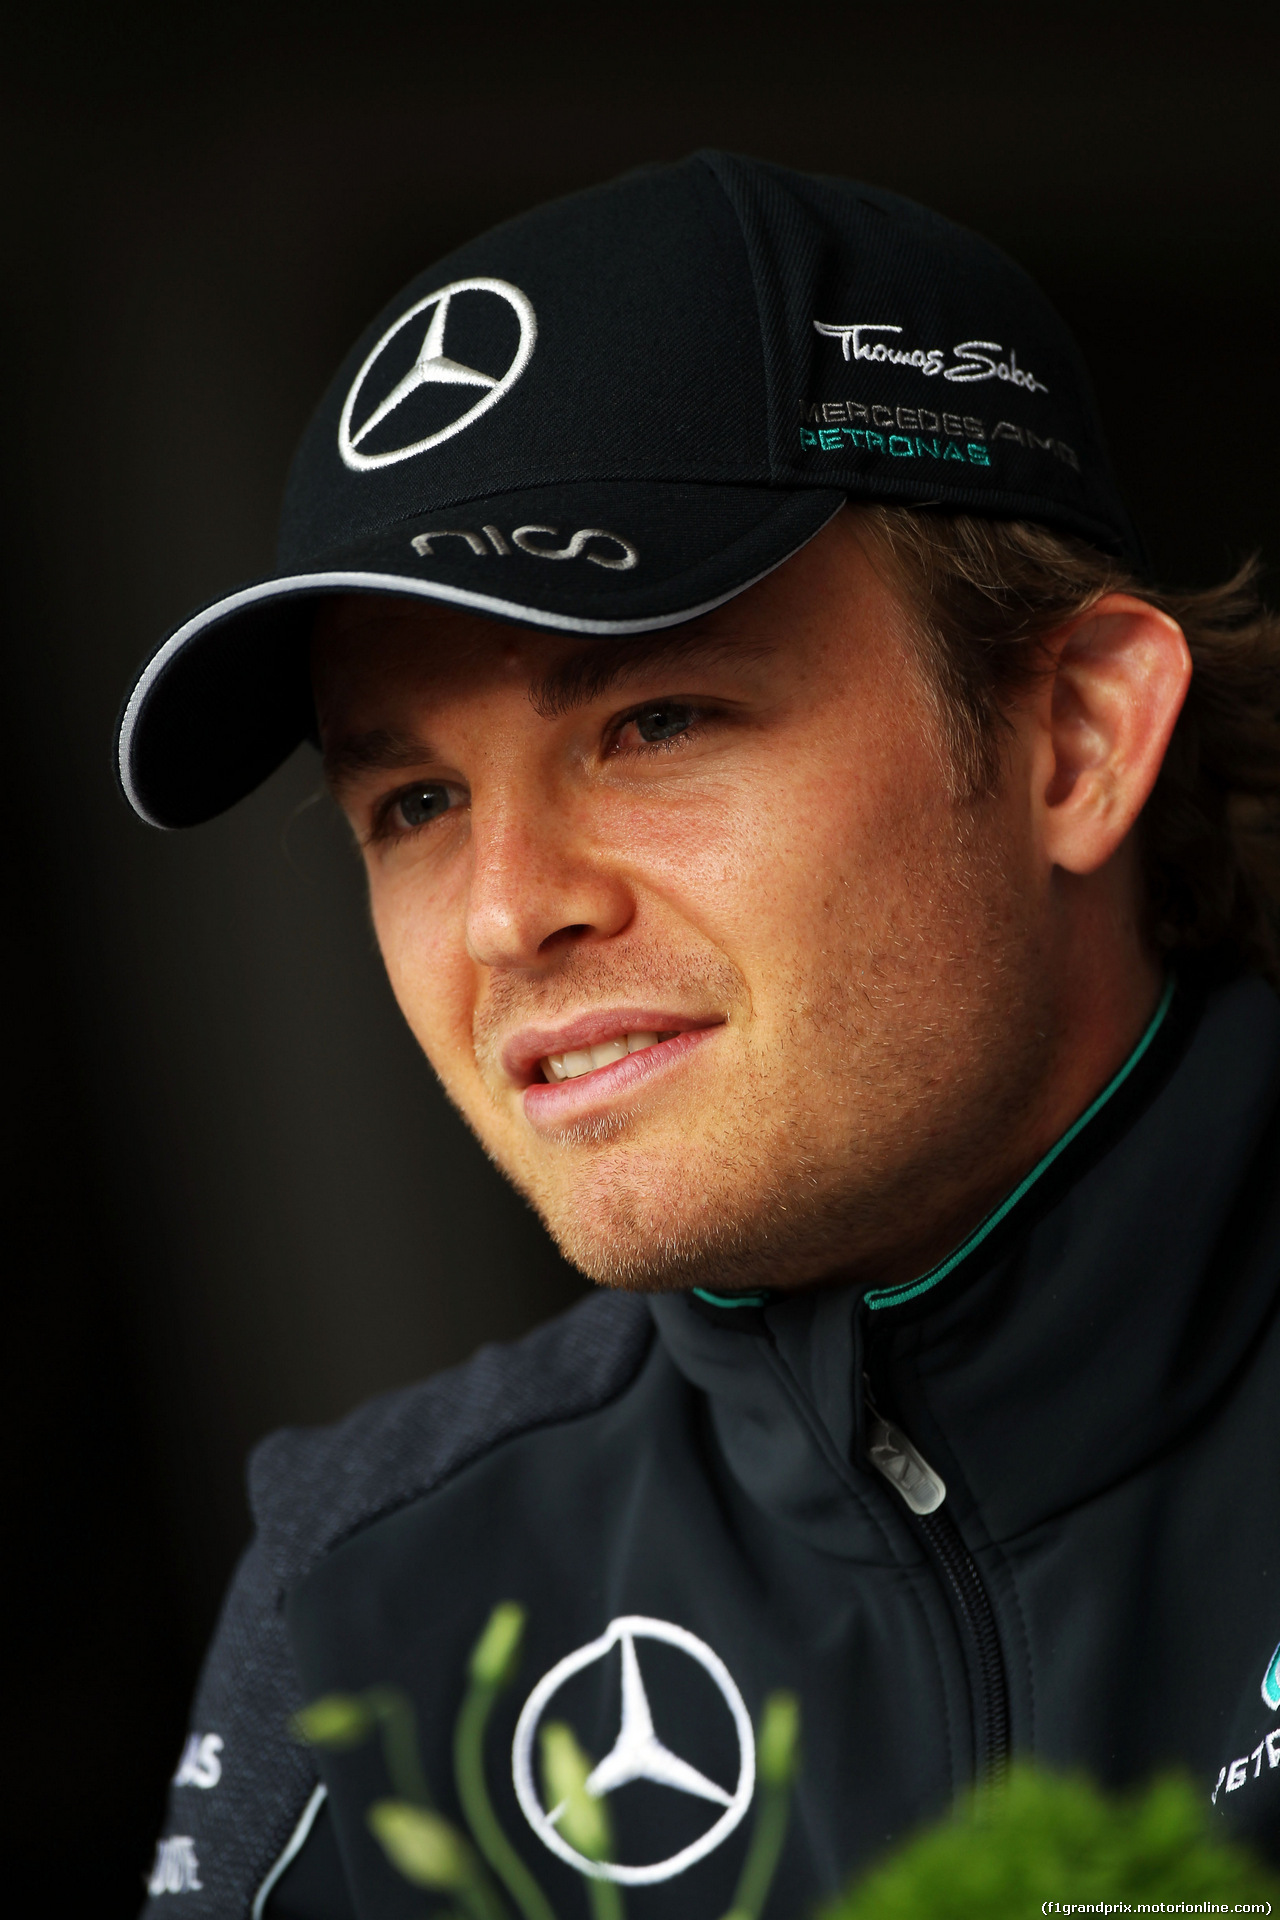 GP BAHRAIN, Nico Rosberg (GER) Mercedes AMG F1. 03.04.2014. Formula 1 World Championship, Rd 3, Bahrain Grand Prix, Sakhir, Bahrain, Preparation Day.